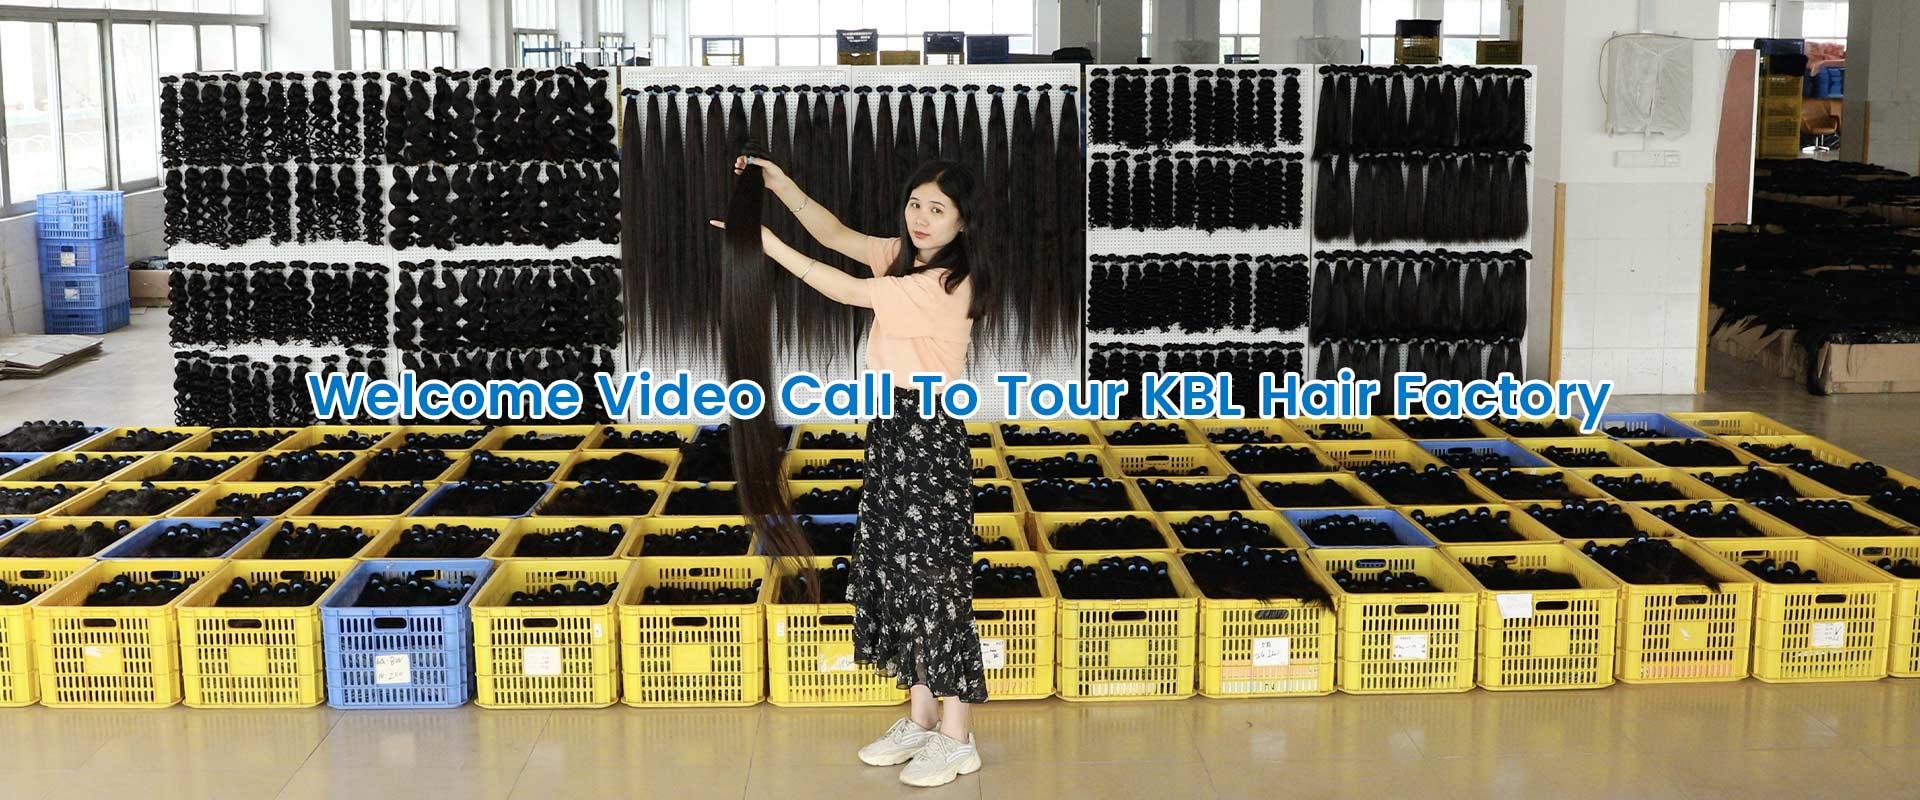 KBL (kabeilu ) Hair Factory.